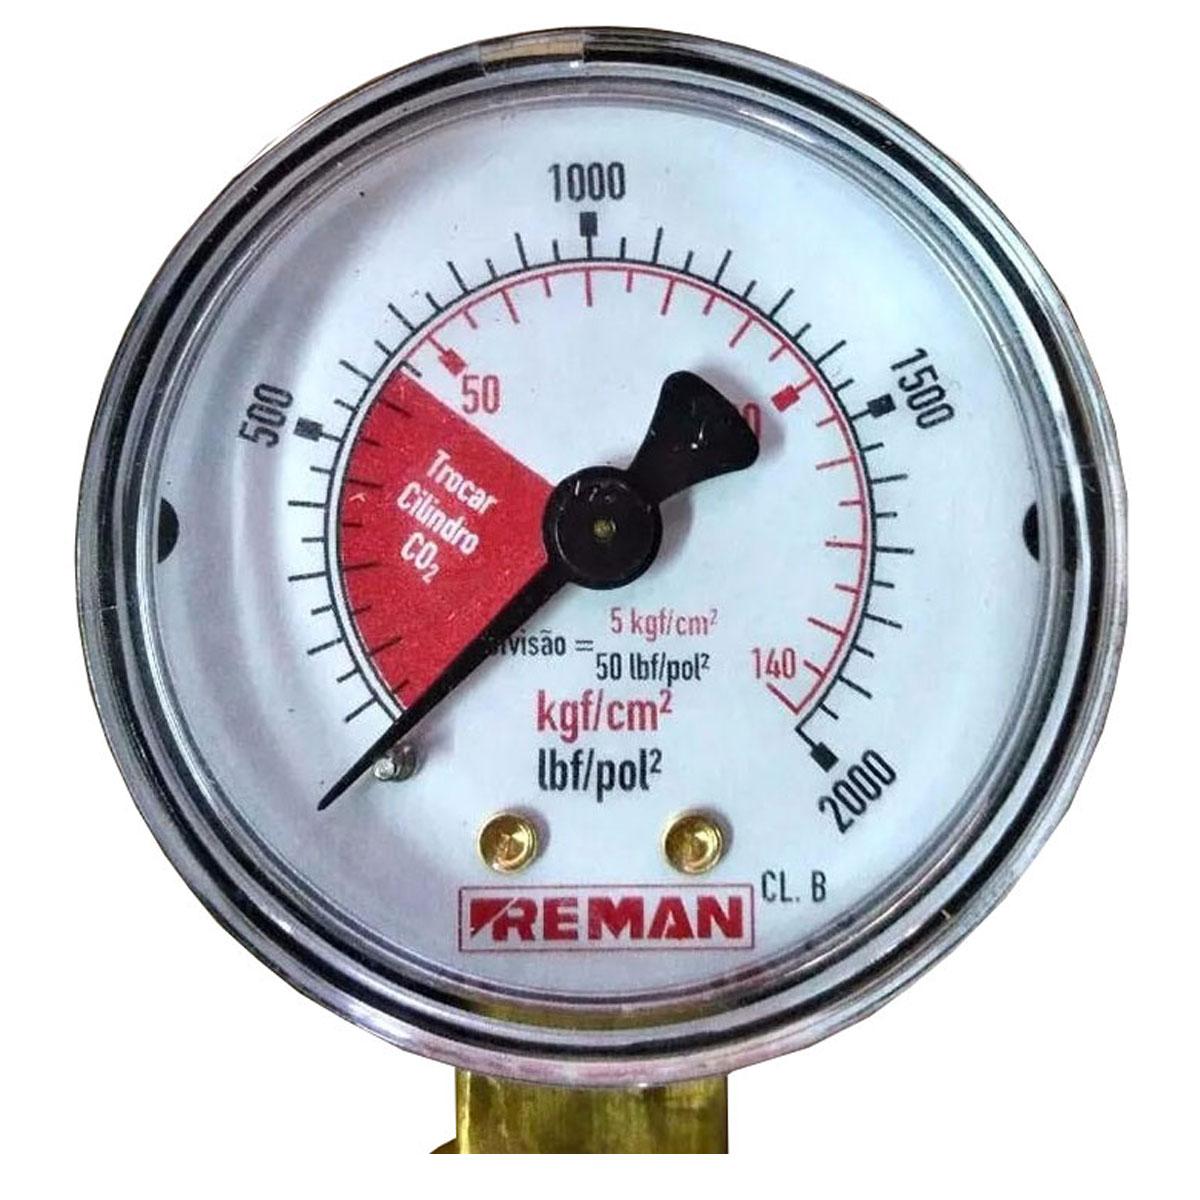 Manômetro Para Medir Carga De Co2 Para Chopp Ou Cerveja Artesanal